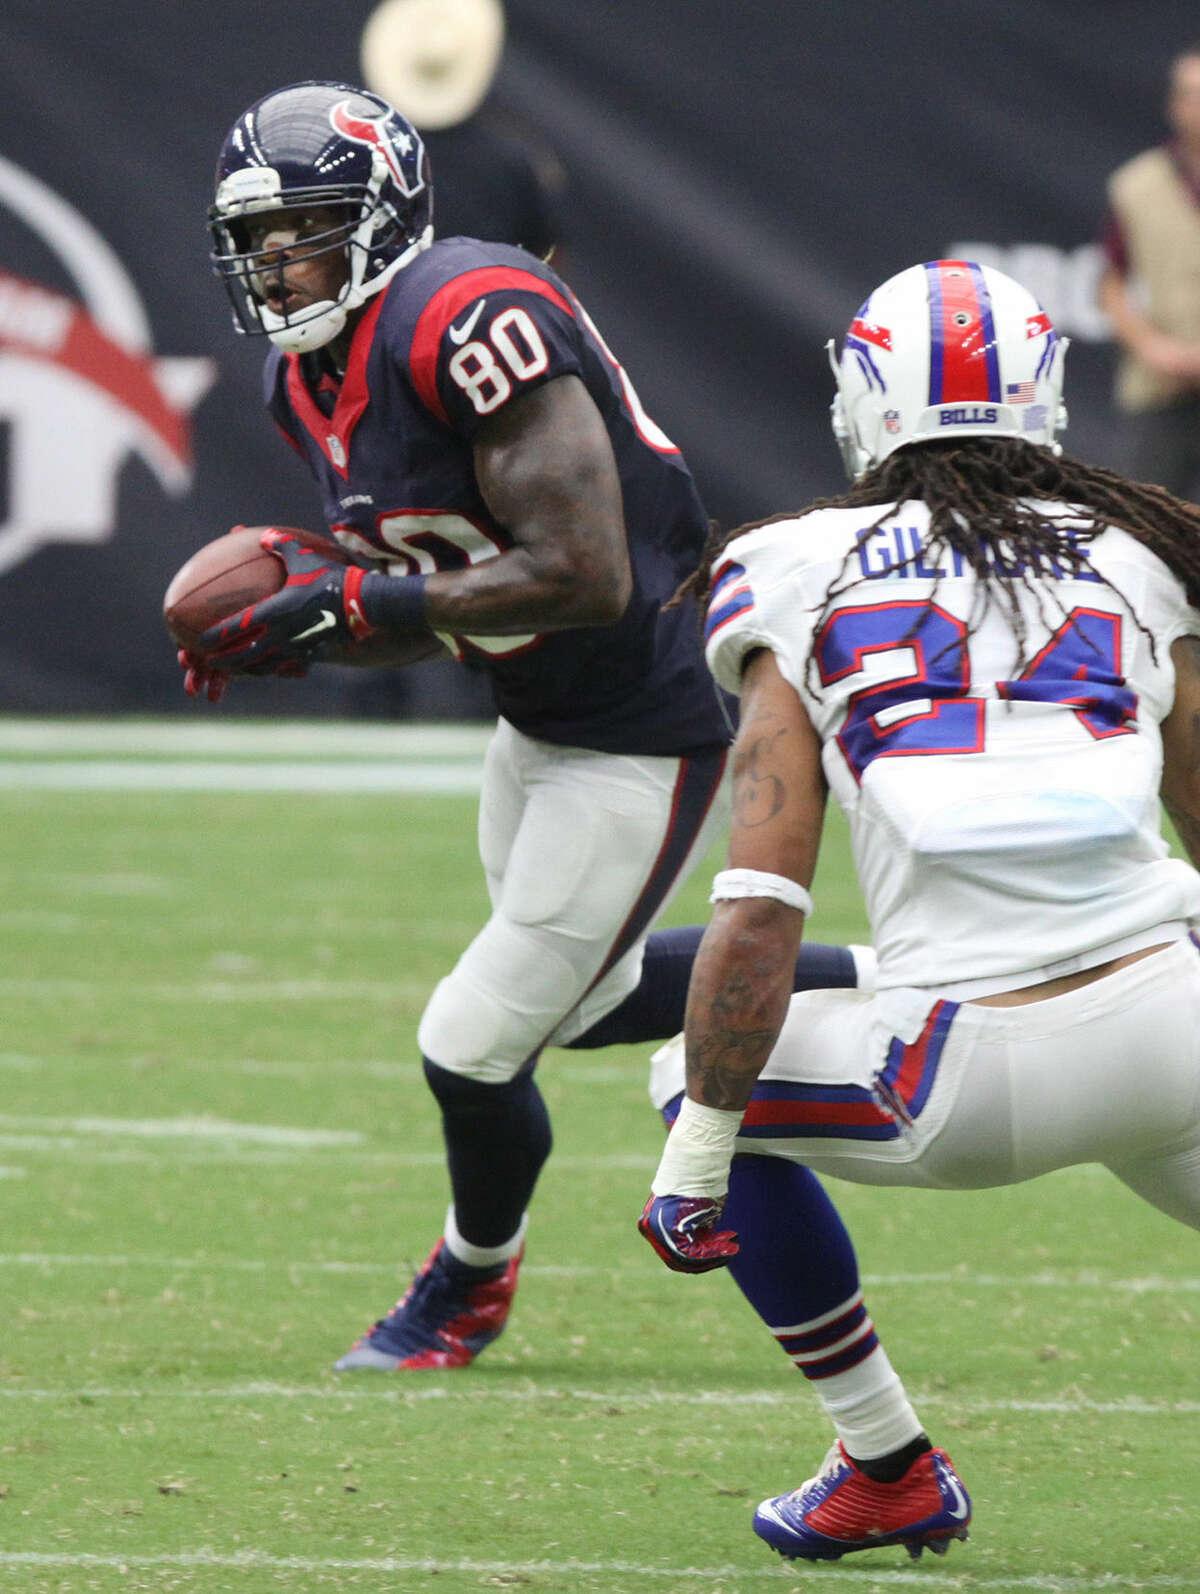 Houston Texans Andre Johnson runs after catch against the Buffalo Bills Stephon Gilmore at NRG Stadium in Houston, Texas on Sunday, September 28, 2014.